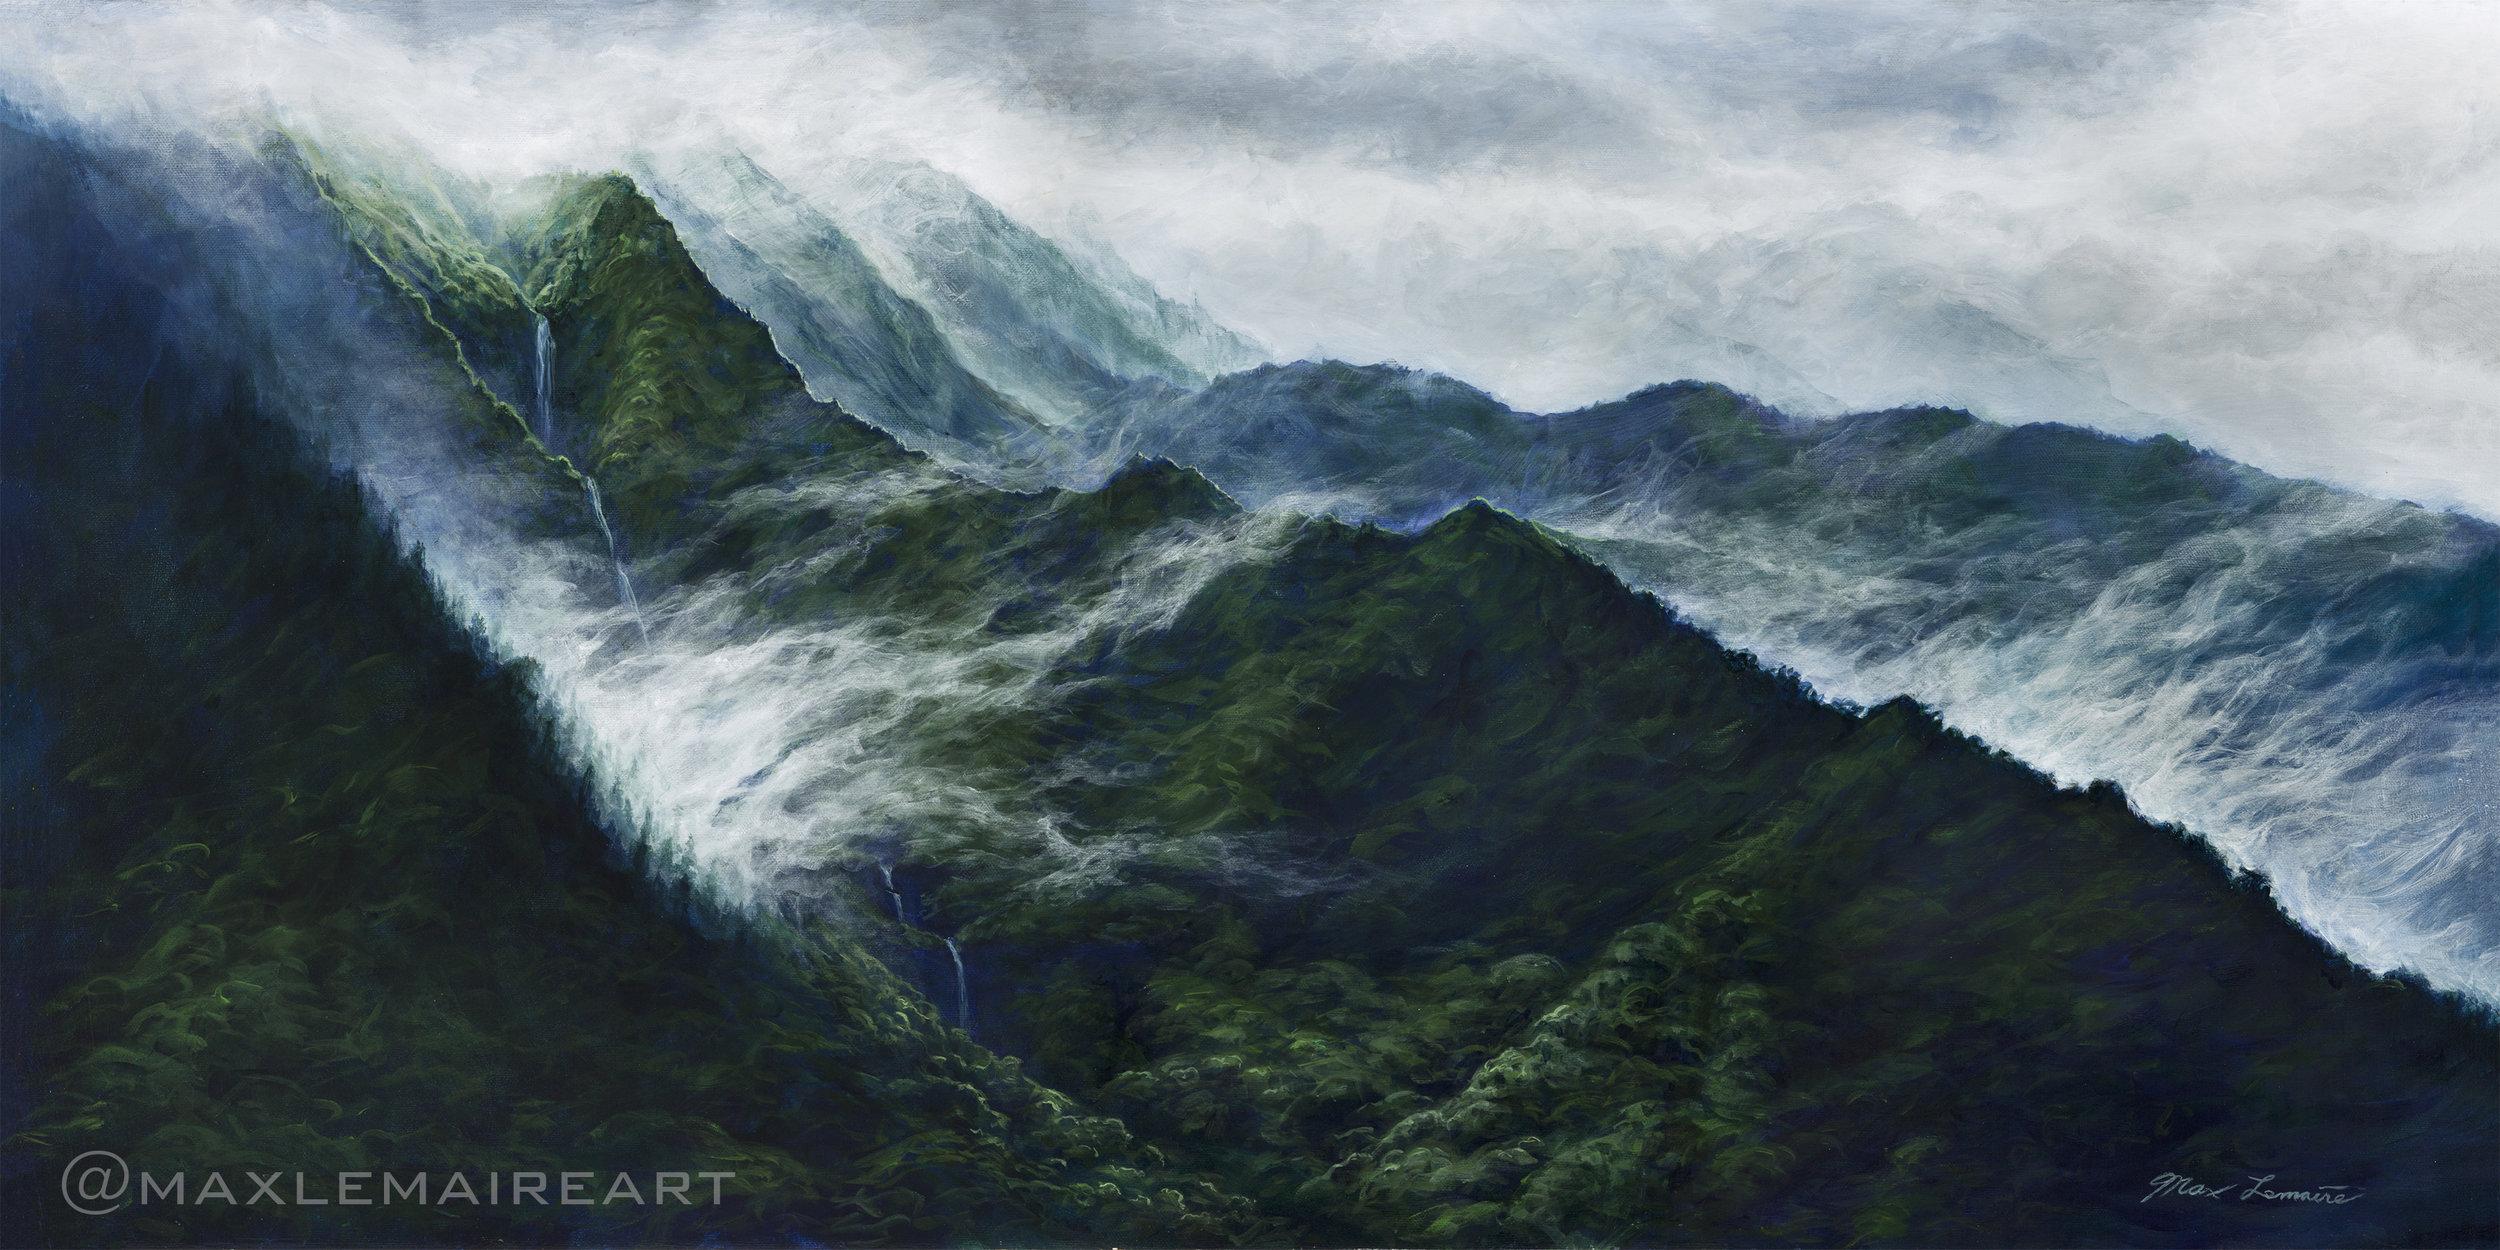 Mists of Mamalahoa